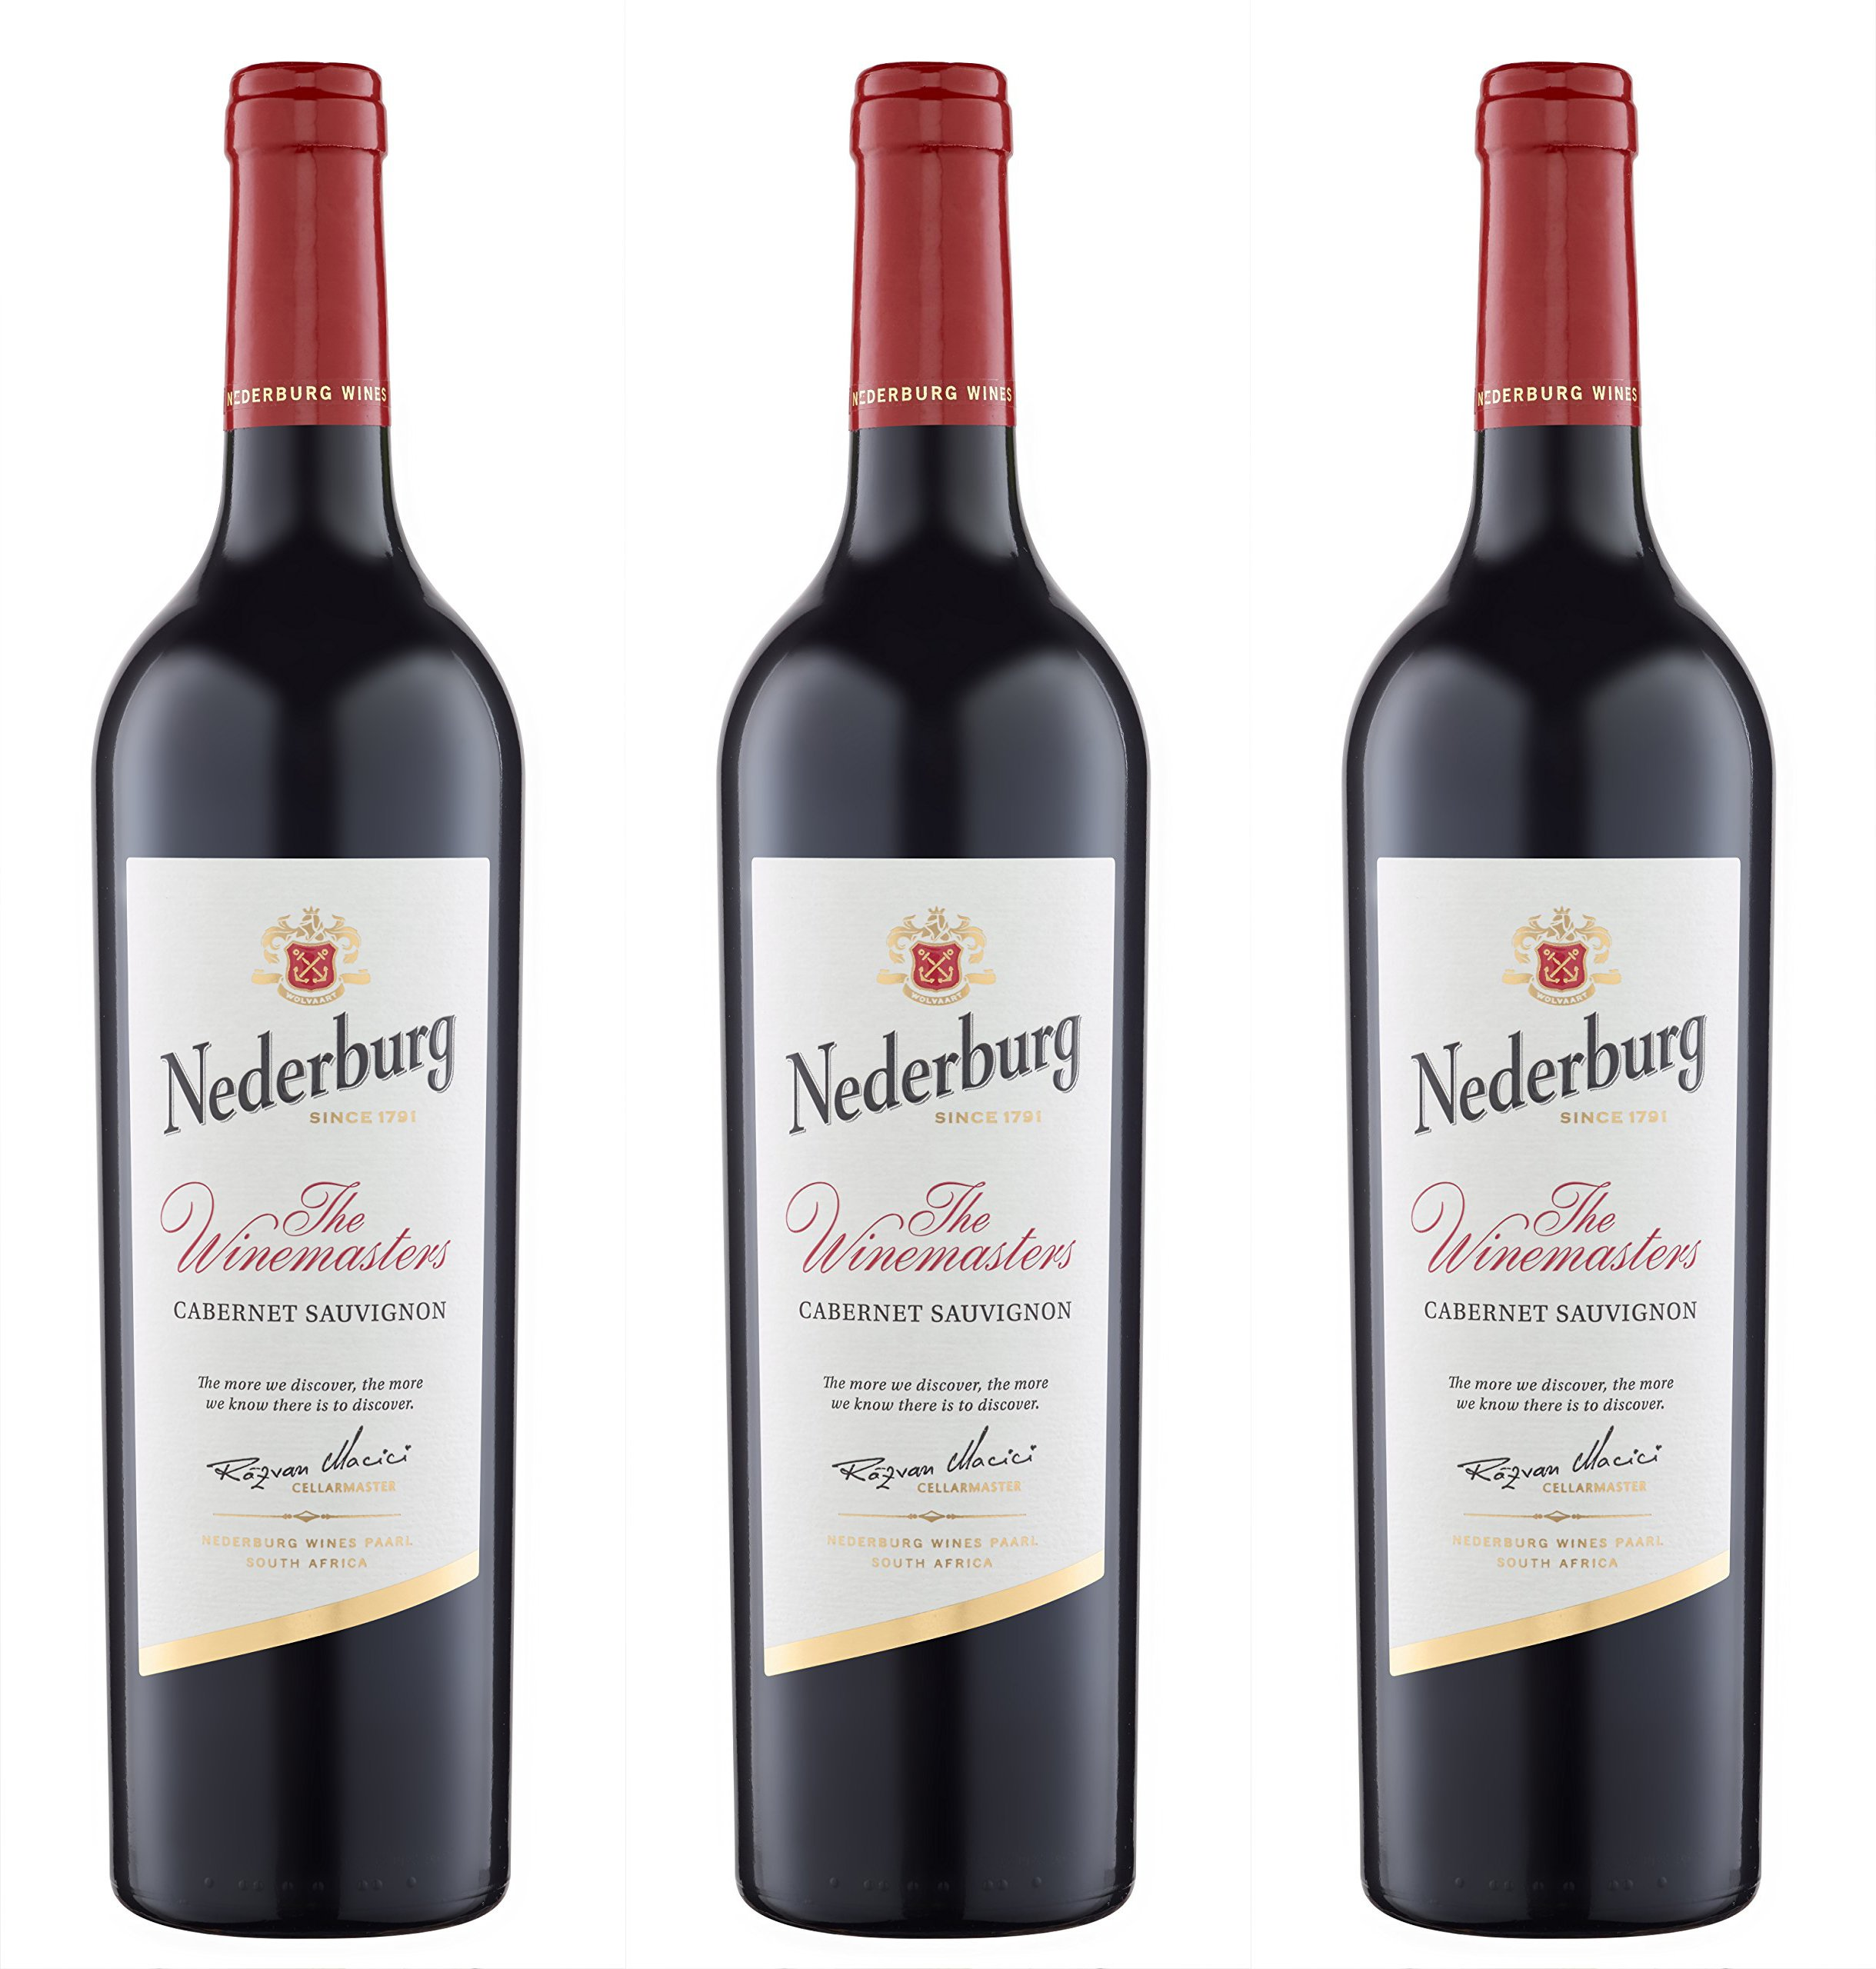 Nederburg-The-Winemasters-Cabernet-Sauvignon-Selection-20142016-Trocken-3-x-075-l